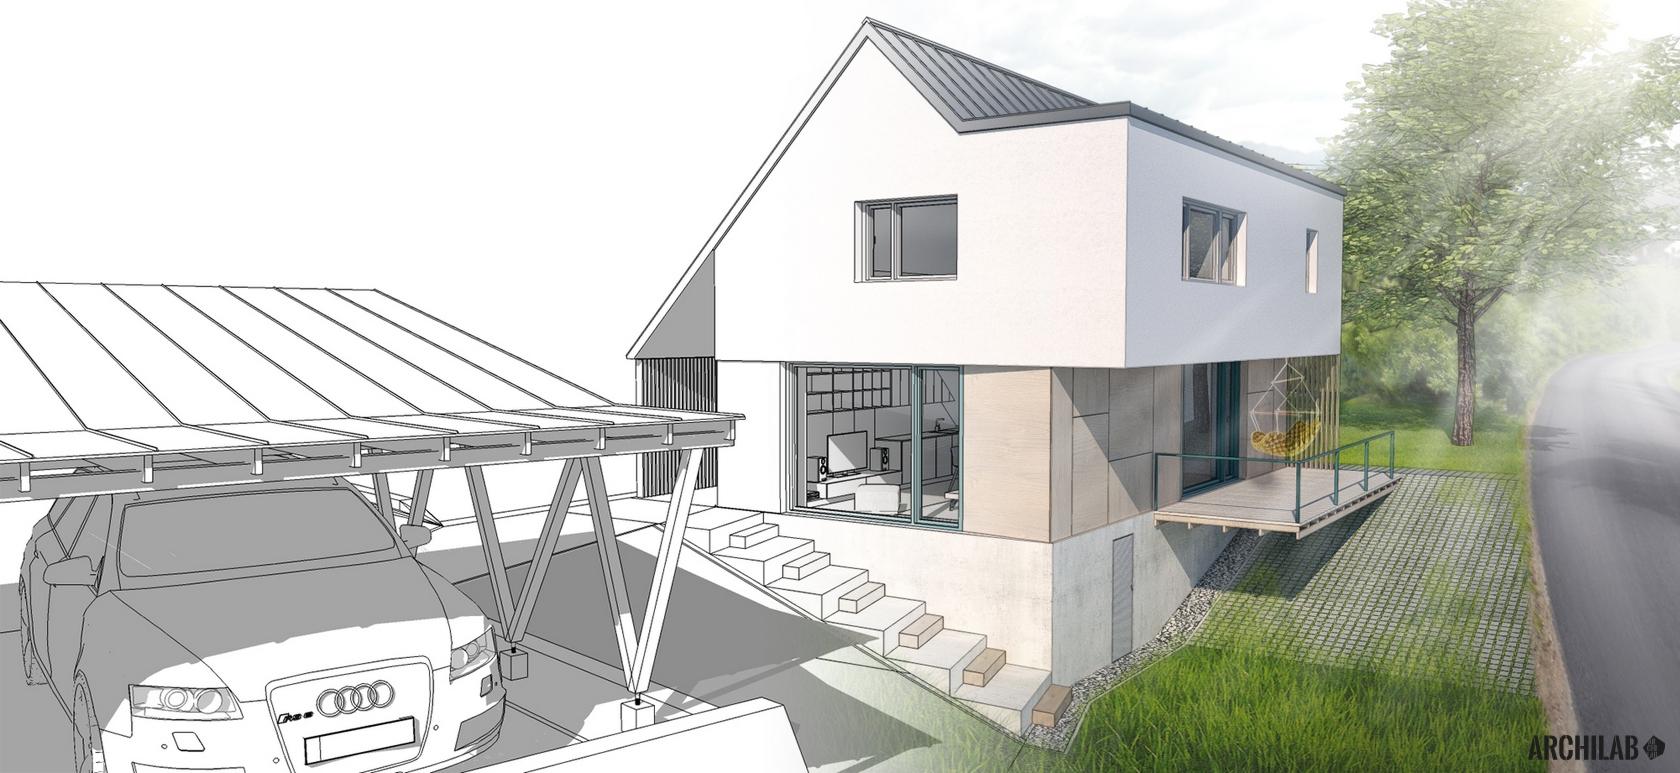 preco-oslovit-architekta-rodinny-dom-rekonstrukcia-navrh-archilab-vizualizacia-schema-sedlova strecha-03